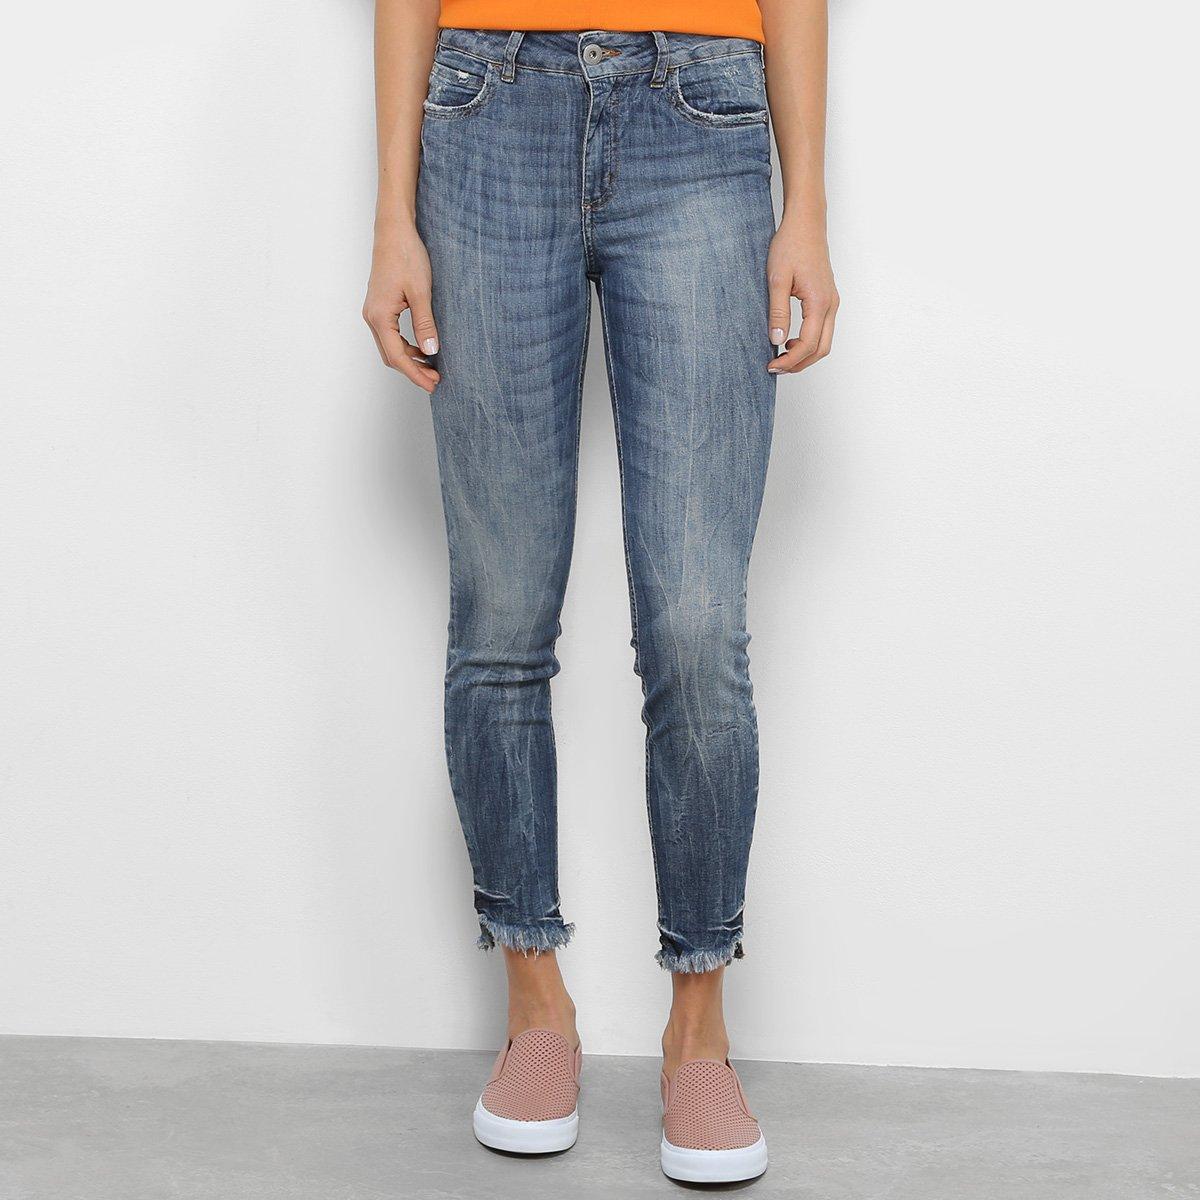 50a8c02bd Calça Jeans Skinny Colcci Bia Estonada Feminina